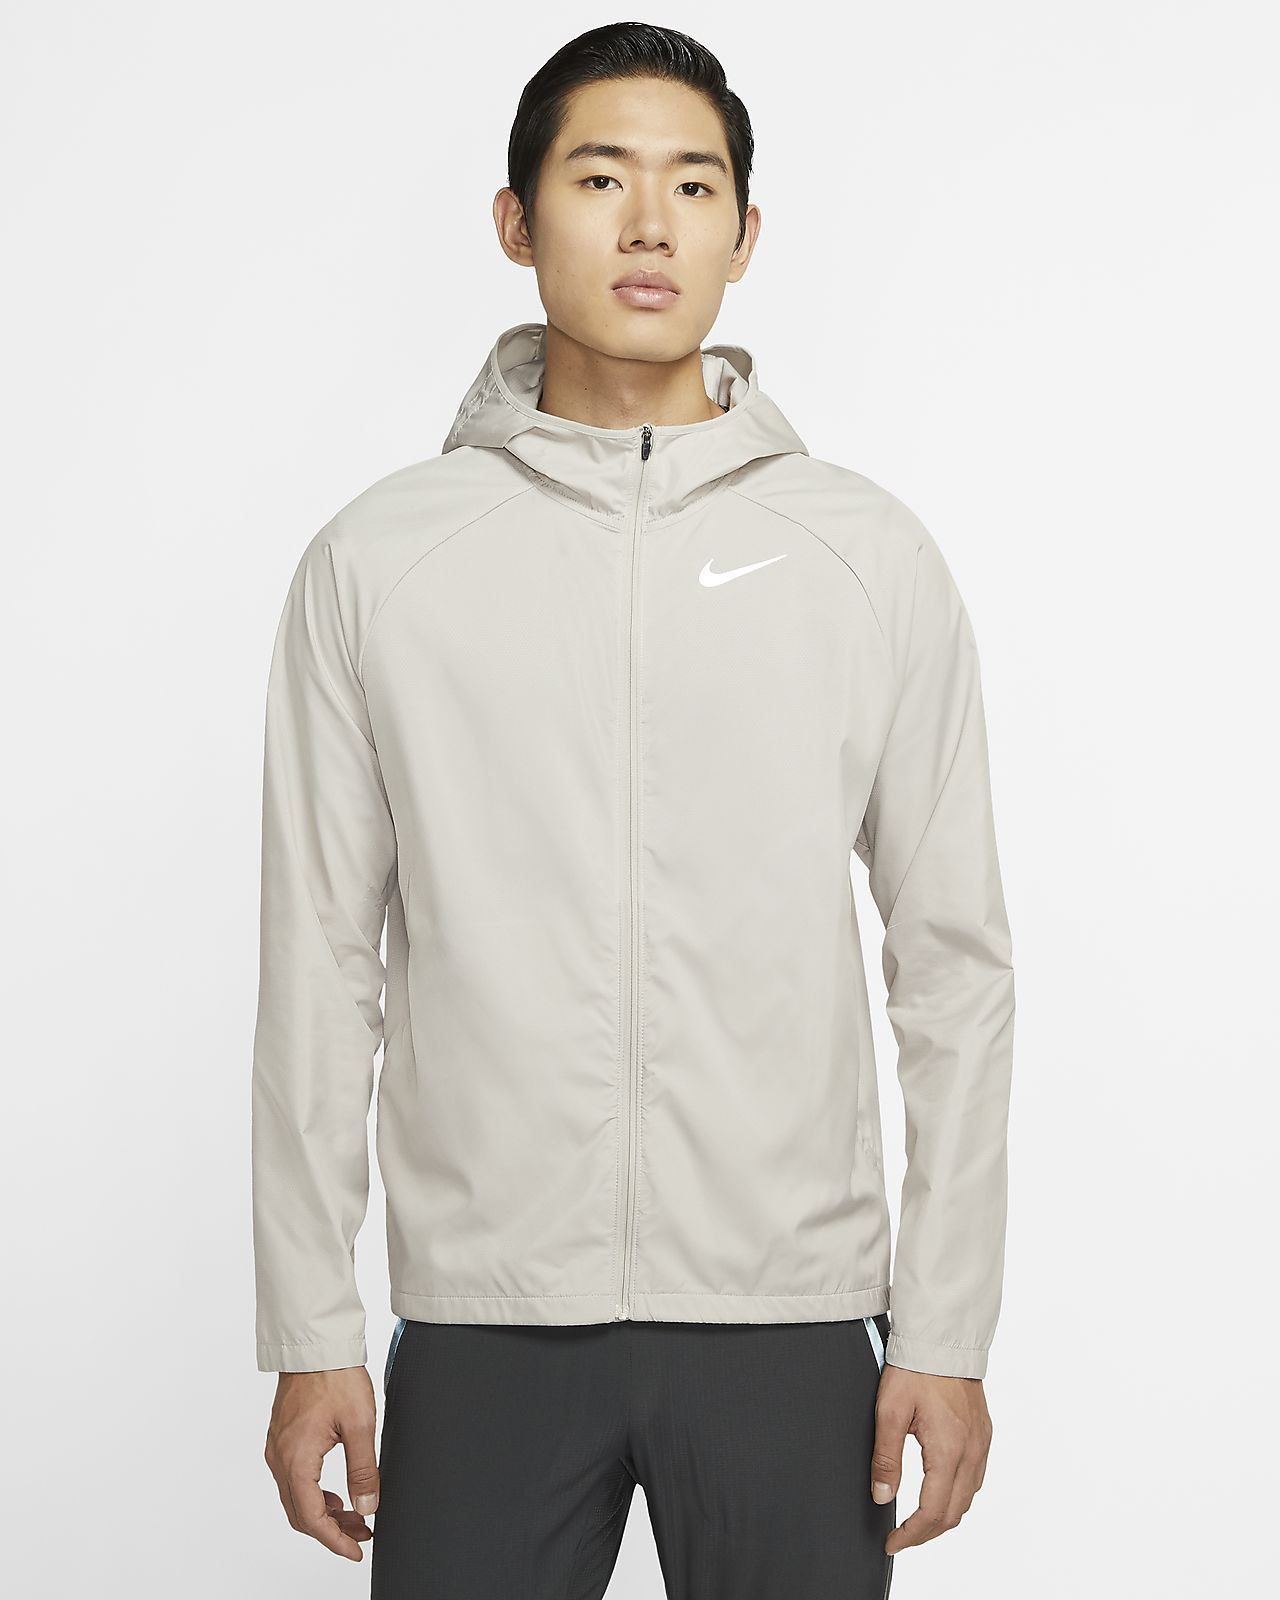 Nike Essential 男子跑步连帽夹克